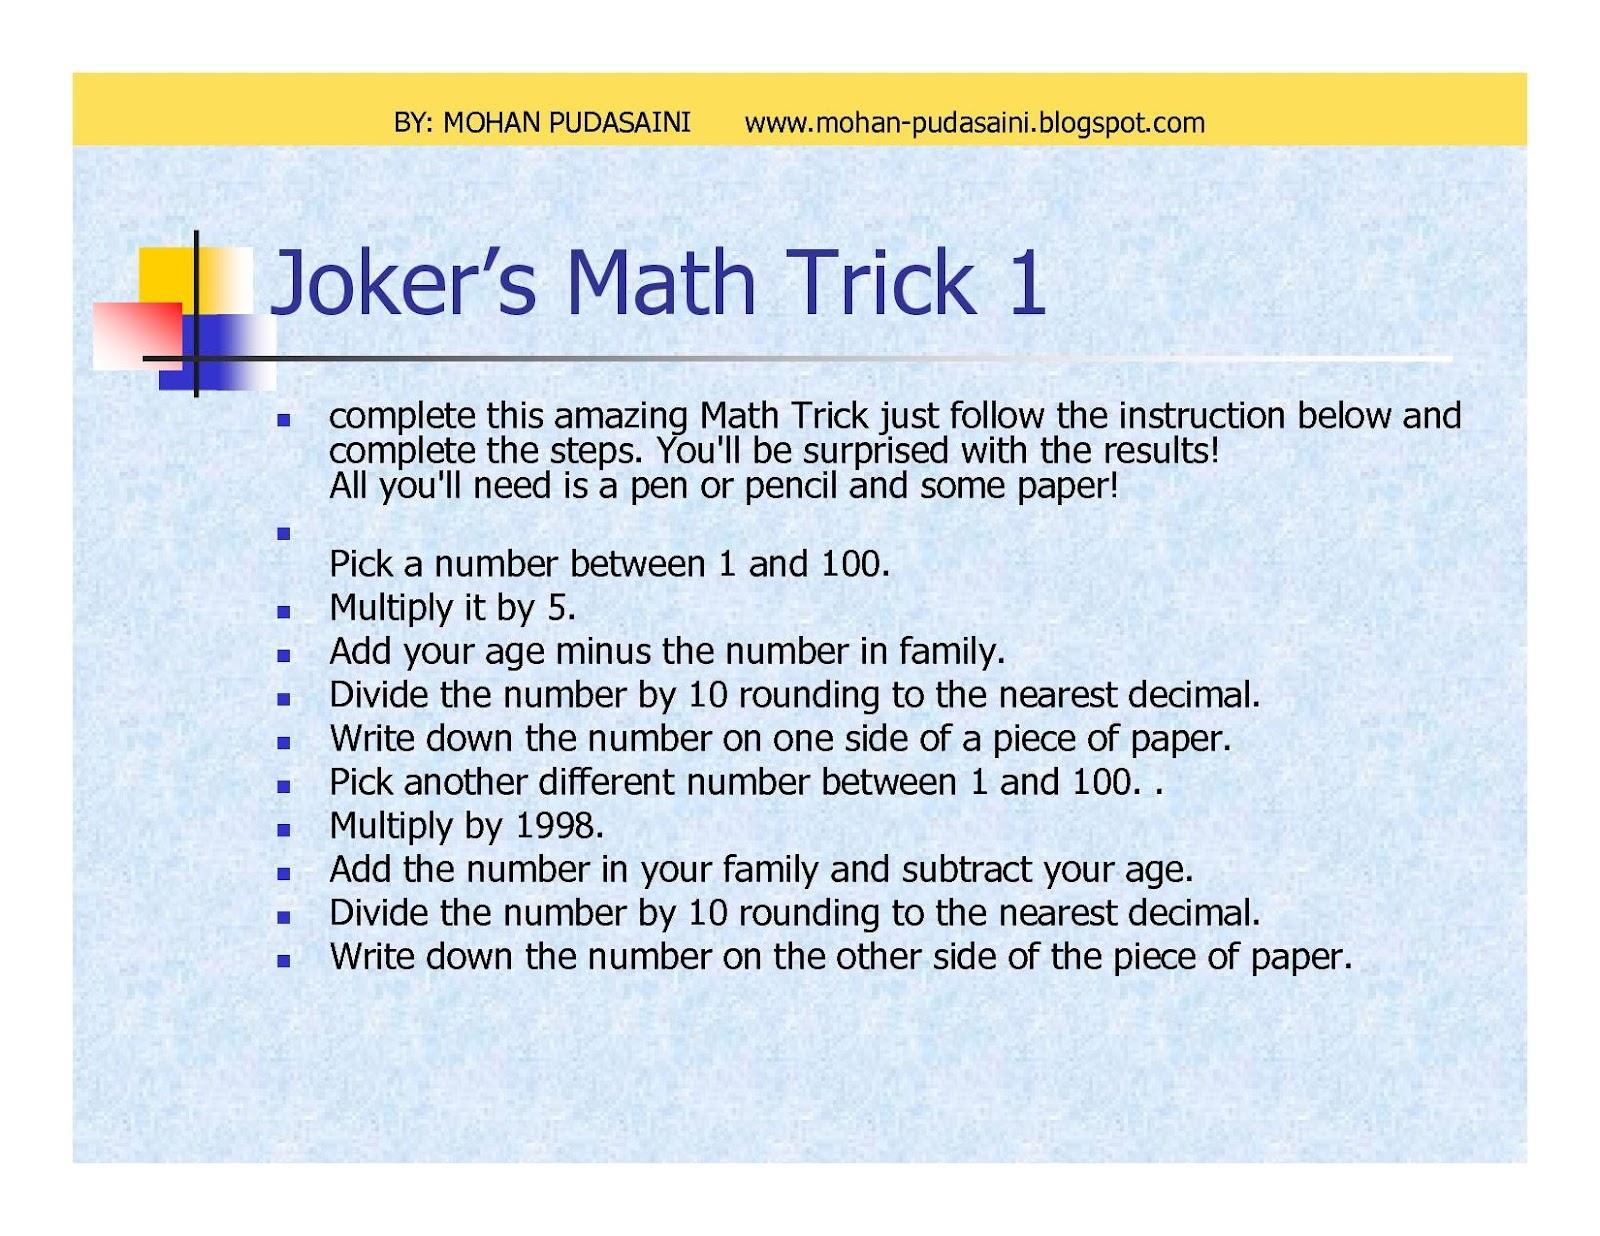 Mathematics tricks ~ Mohan Pudasaini